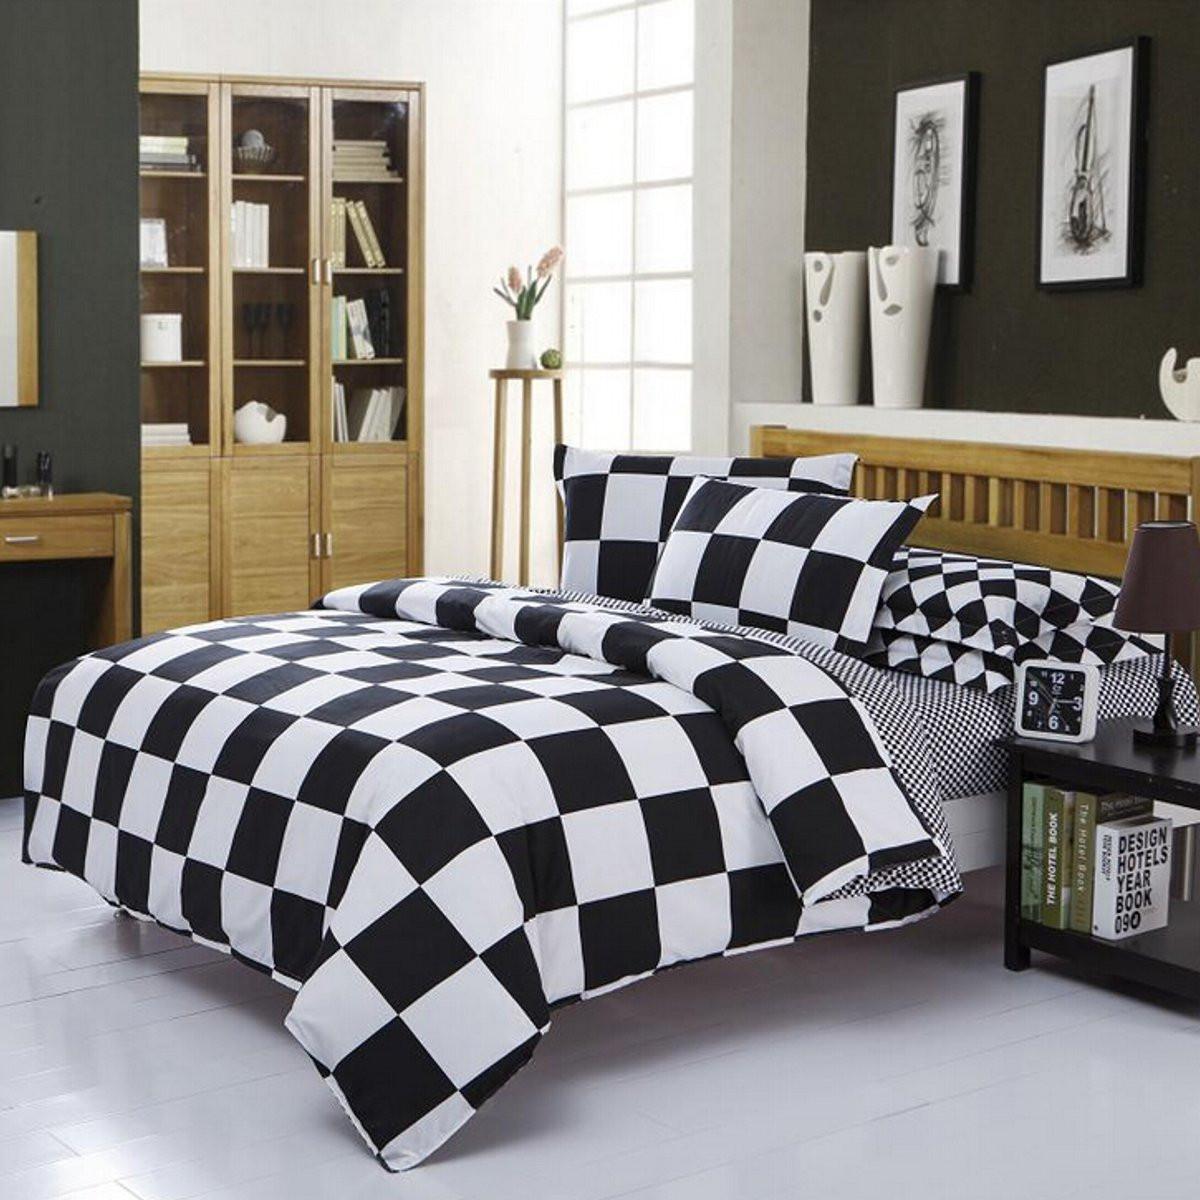 single double queen king size bedding sets pillow case sheet quilt duvet cover ebay. Black Bedroom Furniture Sets. Home Design Ideas